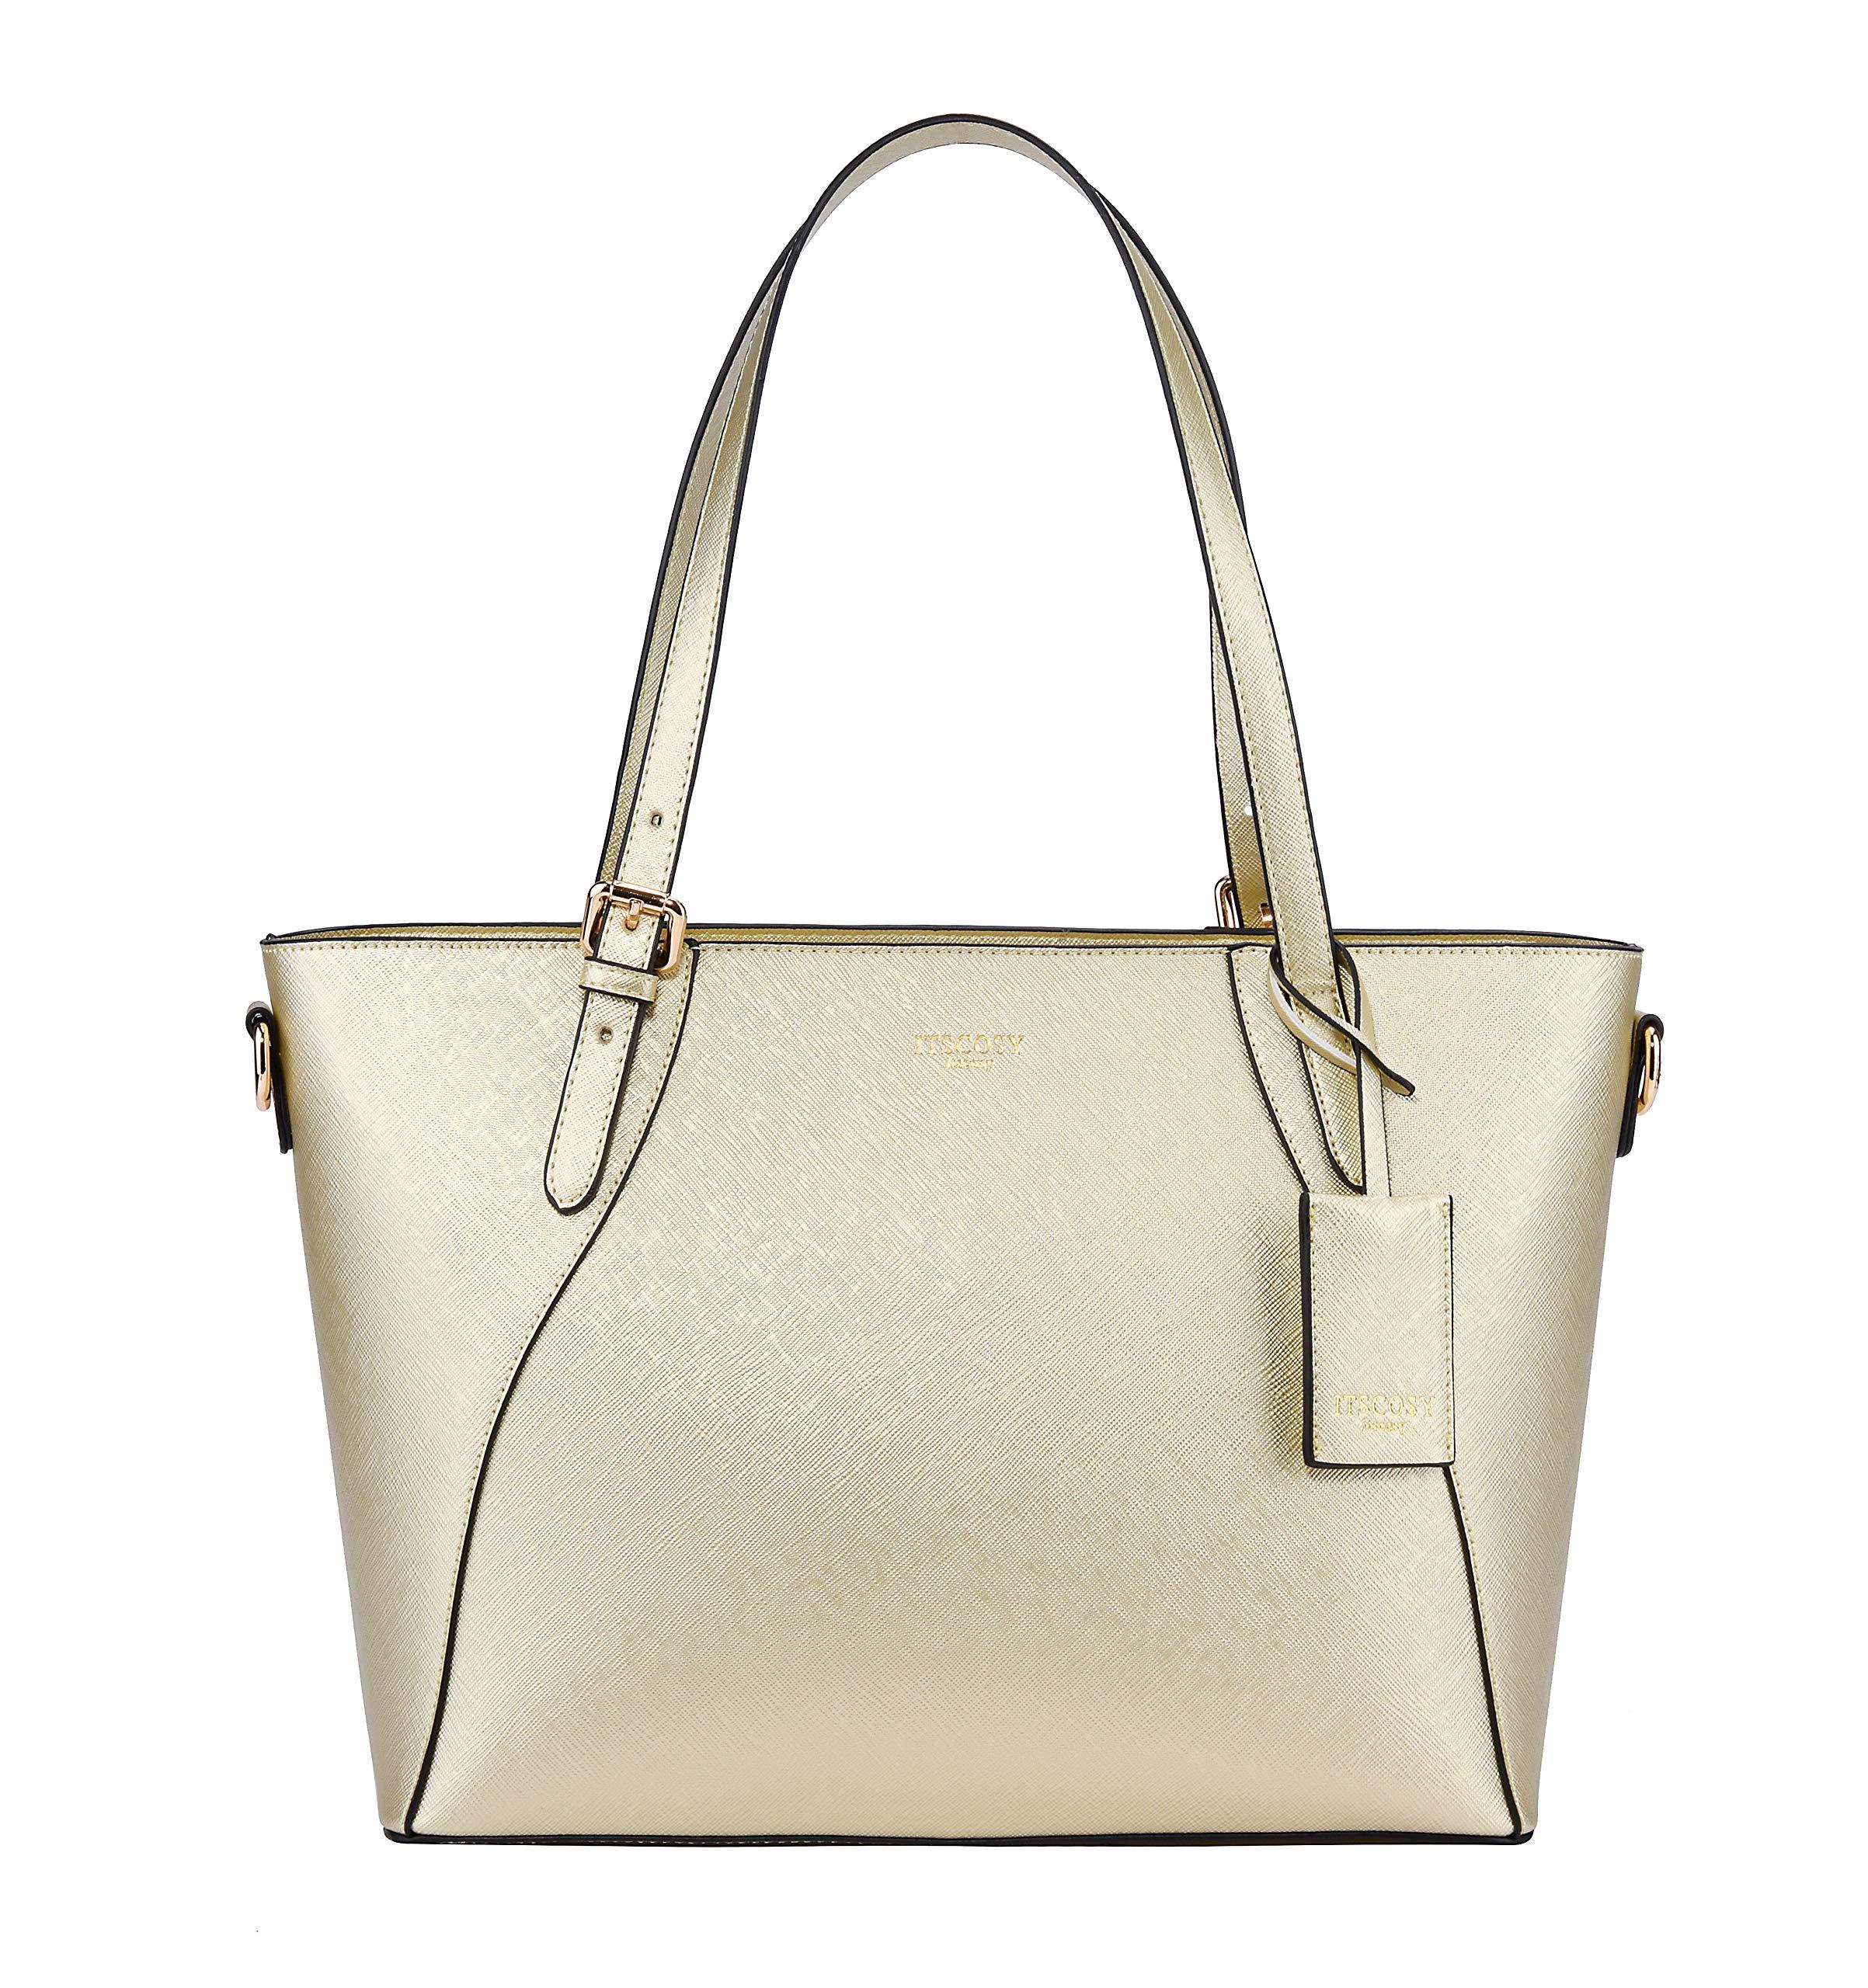 Tote Bag for Women Shoulder Bags Handbags Satchel Hobo 4pcs Purse Set (Light gold)